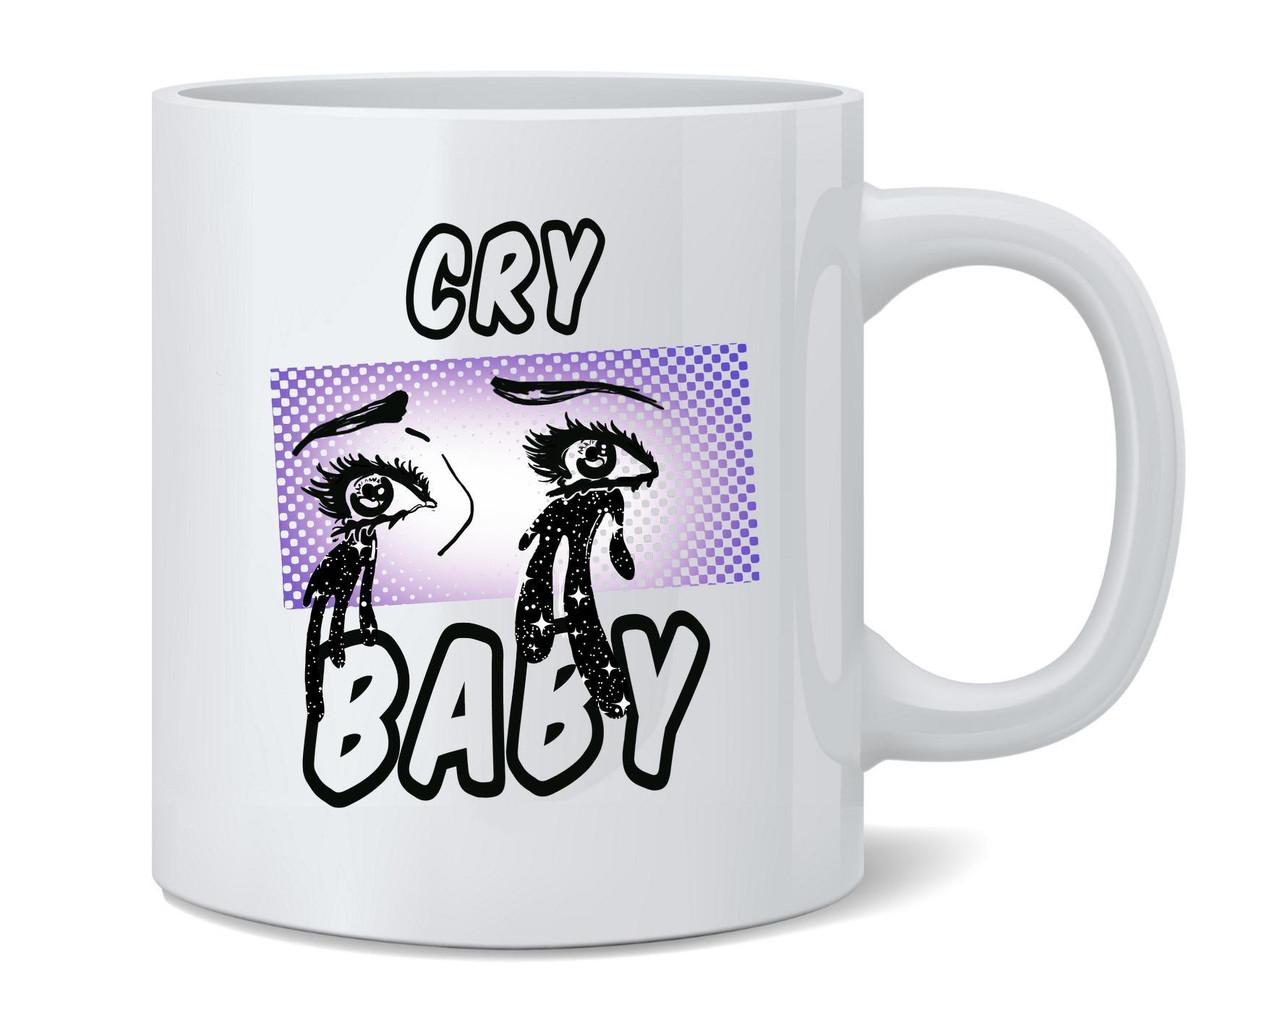 Cry Baby Retro Aesthetic Pop Art Ceramic Coffee Mug Tea Cup Fun Novelty Gift 12 Oz Poster Foundry